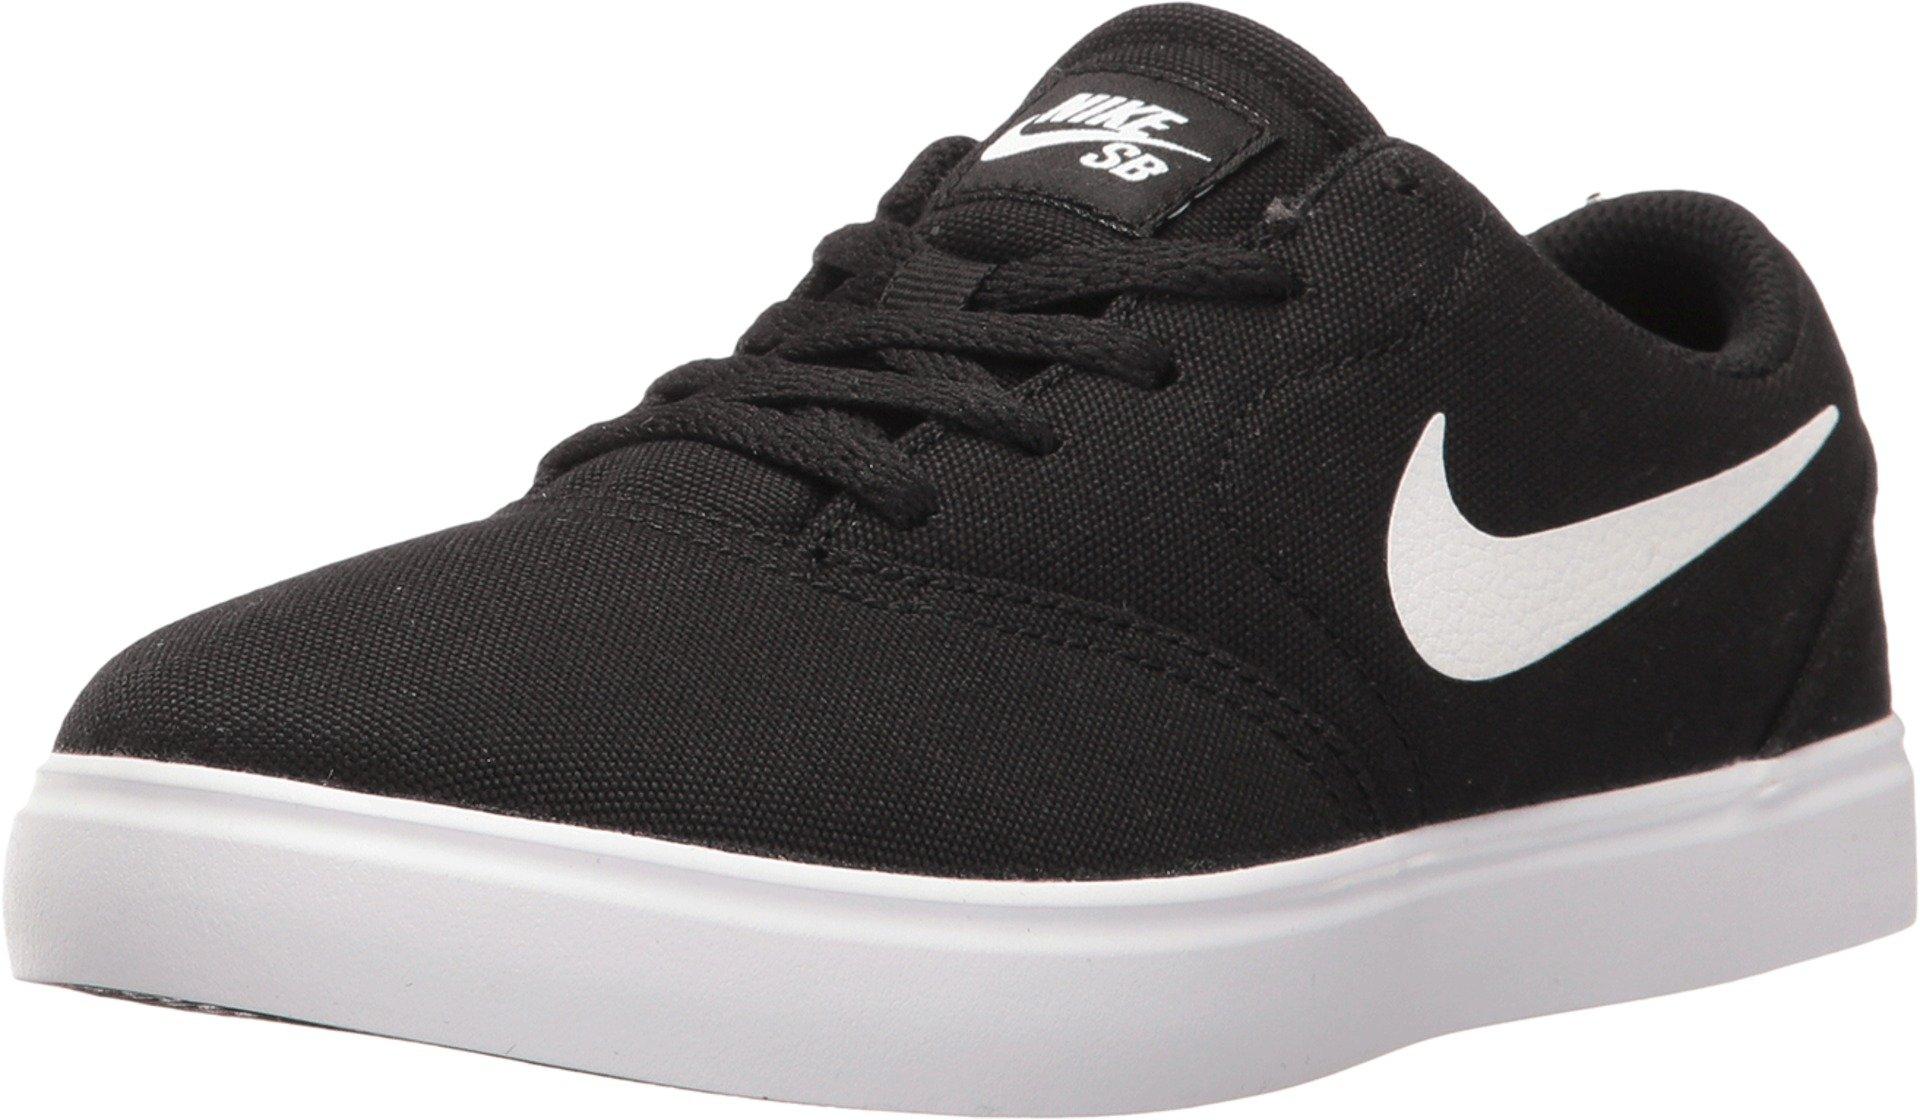 Nike Boy's SB Check Canvas (PS) Skateboarding Shoes (12 Little Kid M, Black/White)